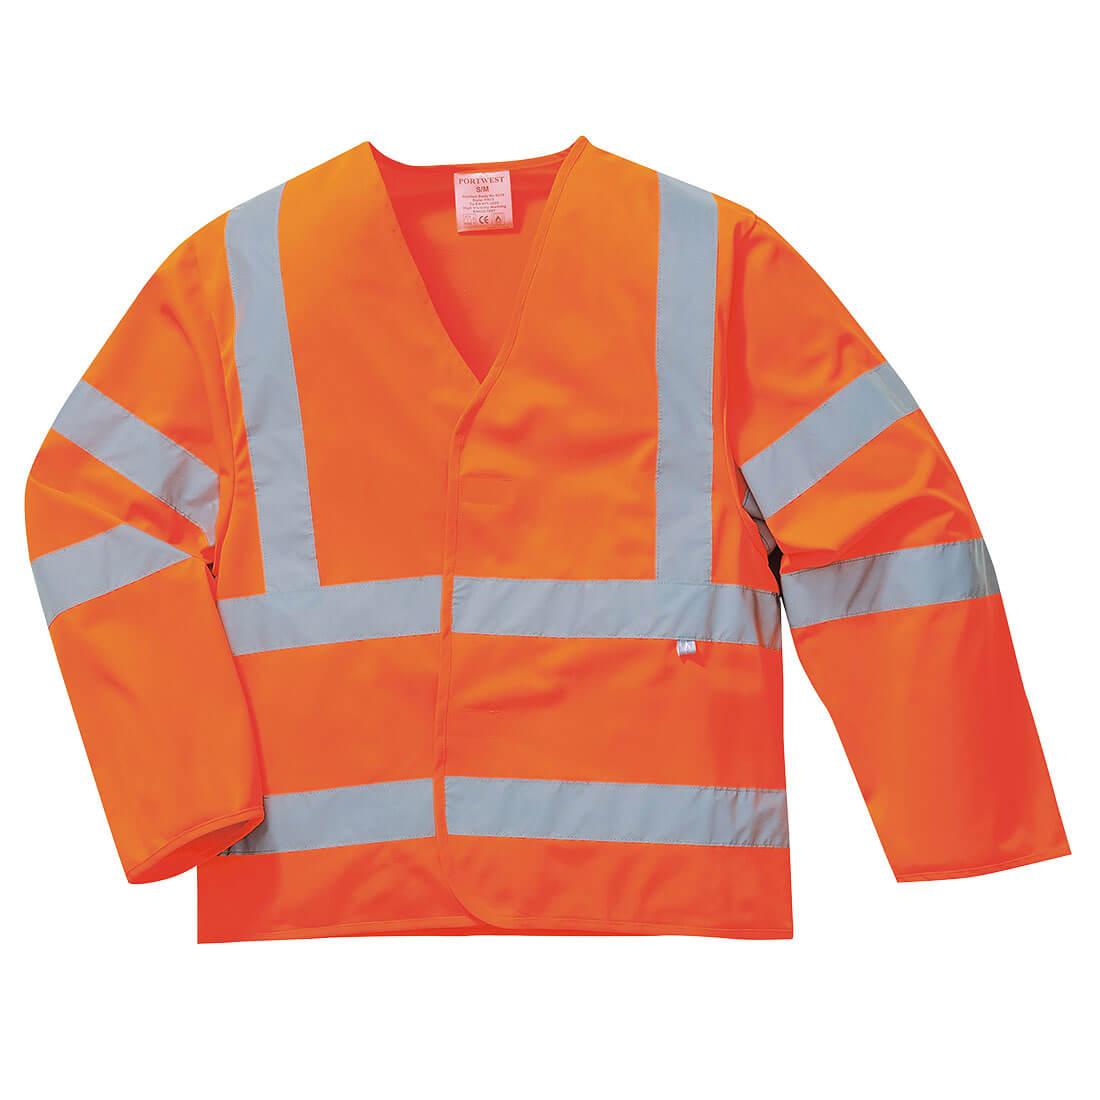 Image of Biz Flame Class 3 Hi Vis Anti Static Flame Resistant Jacket Orange 2XL / 3XL